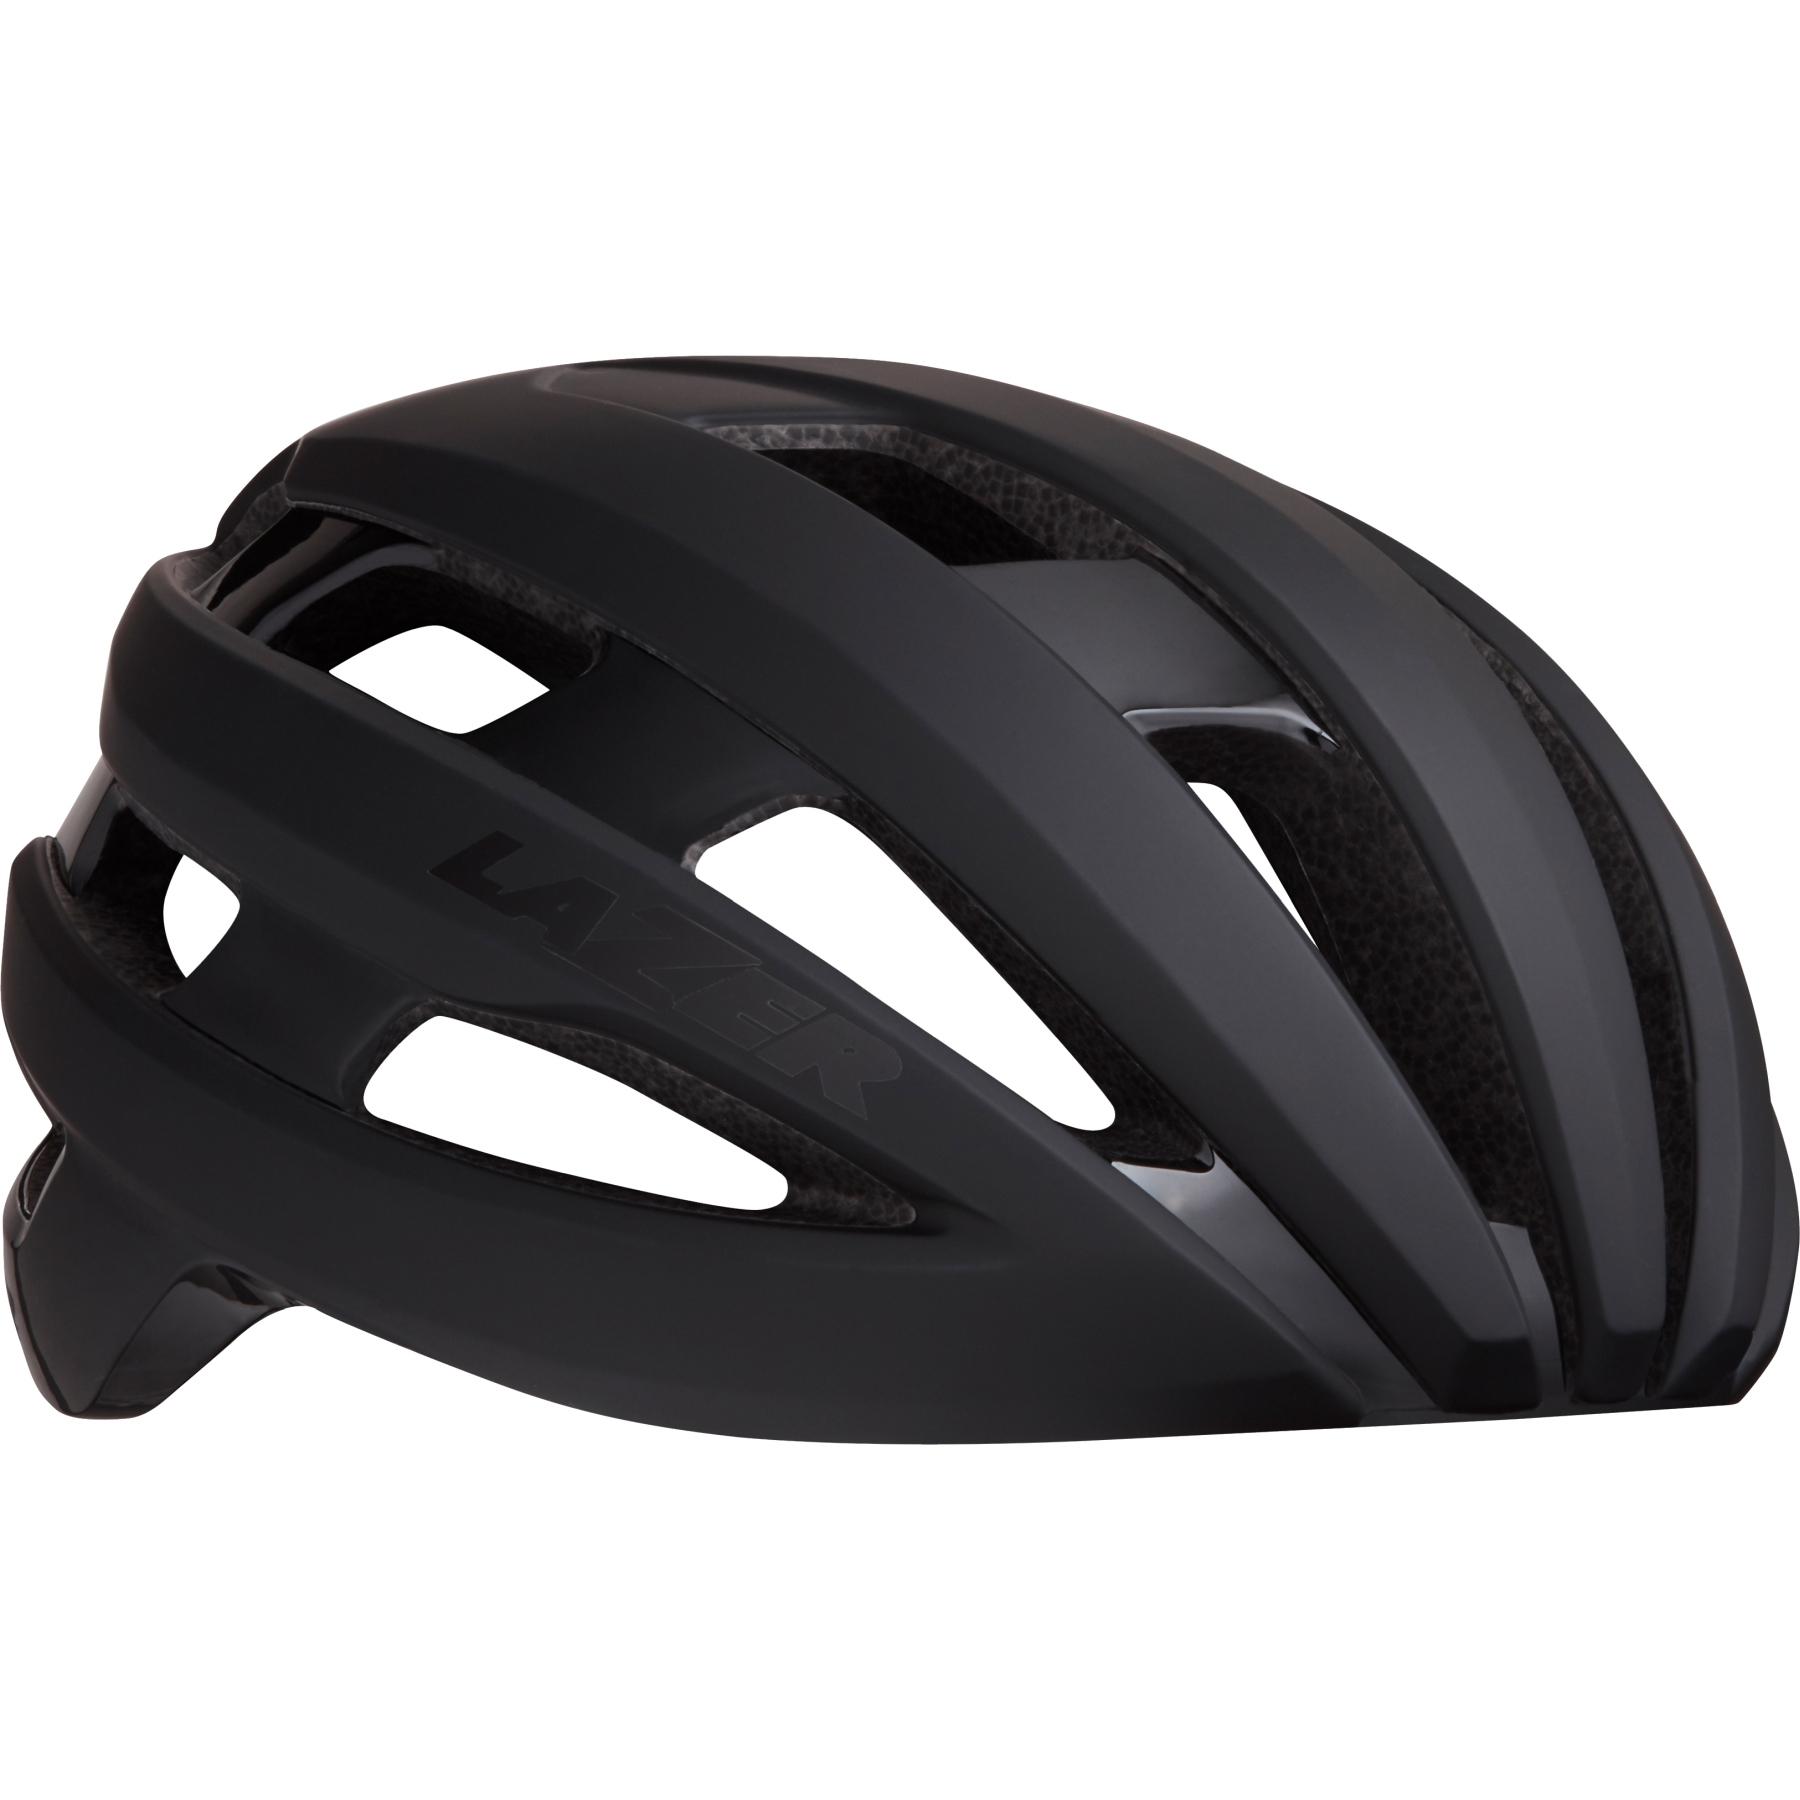 Lazer Sphere Helm - matte black